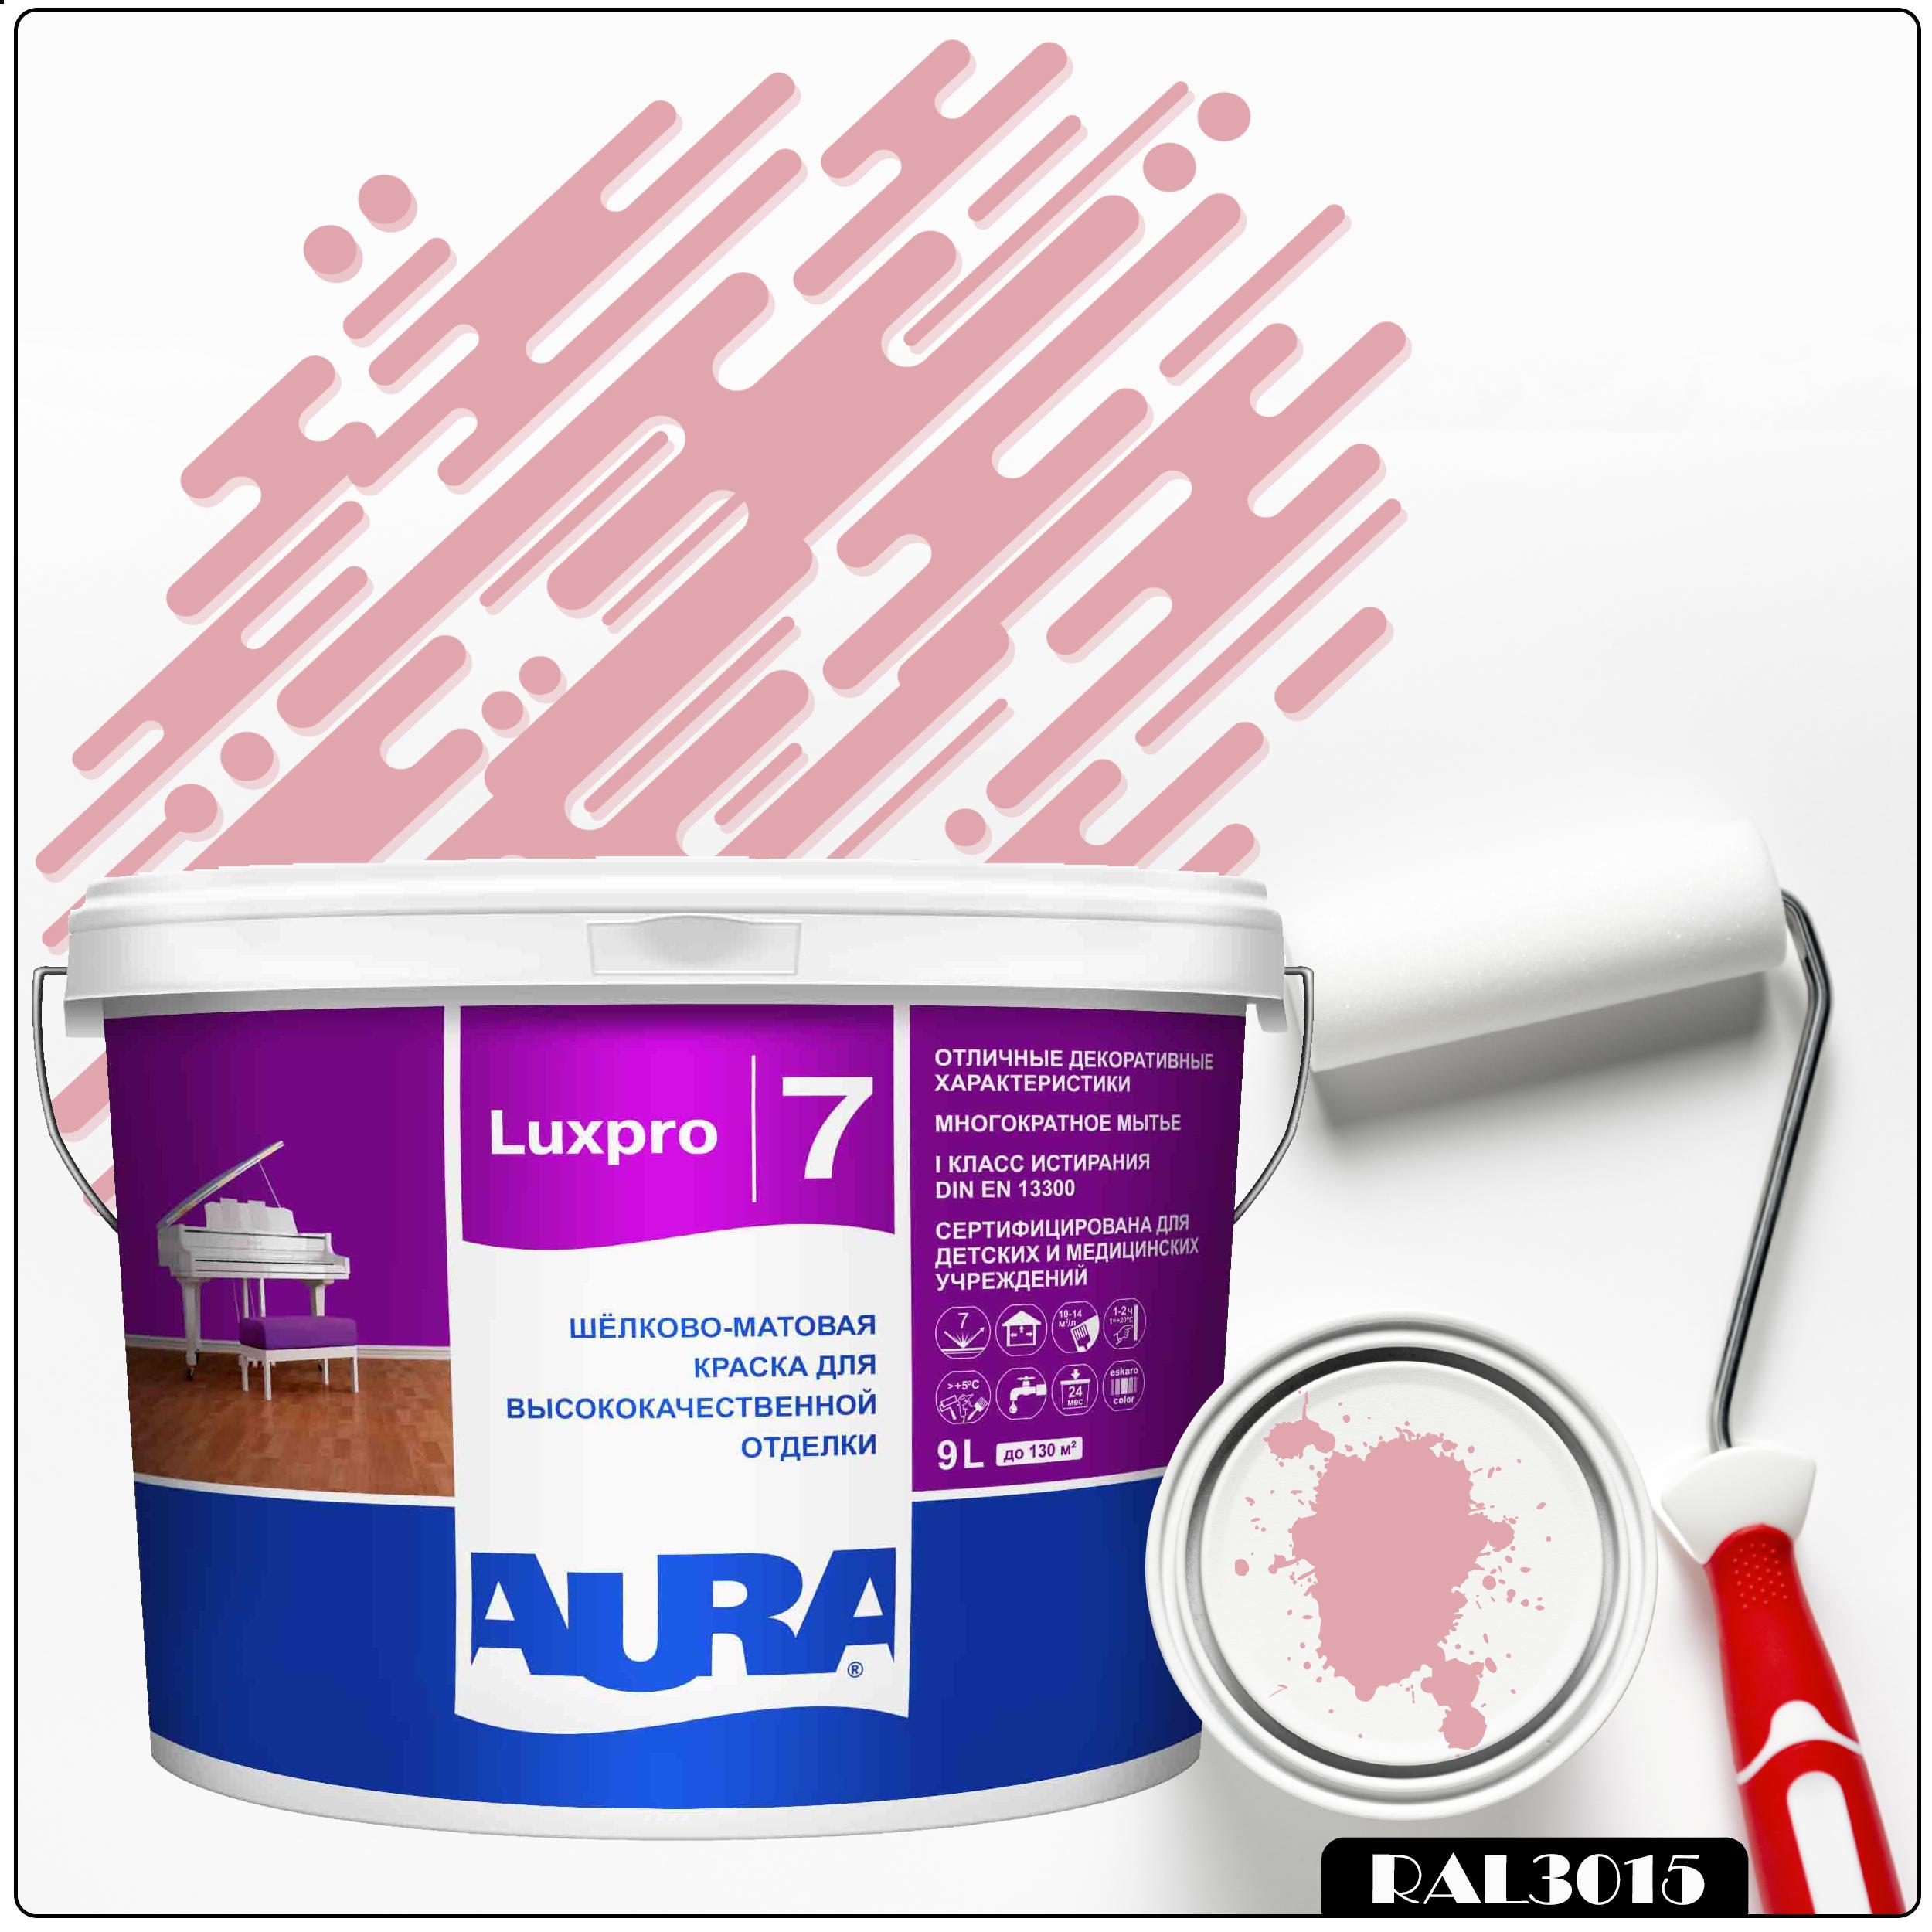 Фото 13 - Краска Aura LuxPRO 7, RAL 3015 Светло-розовый, латексная, шелково-матовая, интерьерная, 9л, Аура.